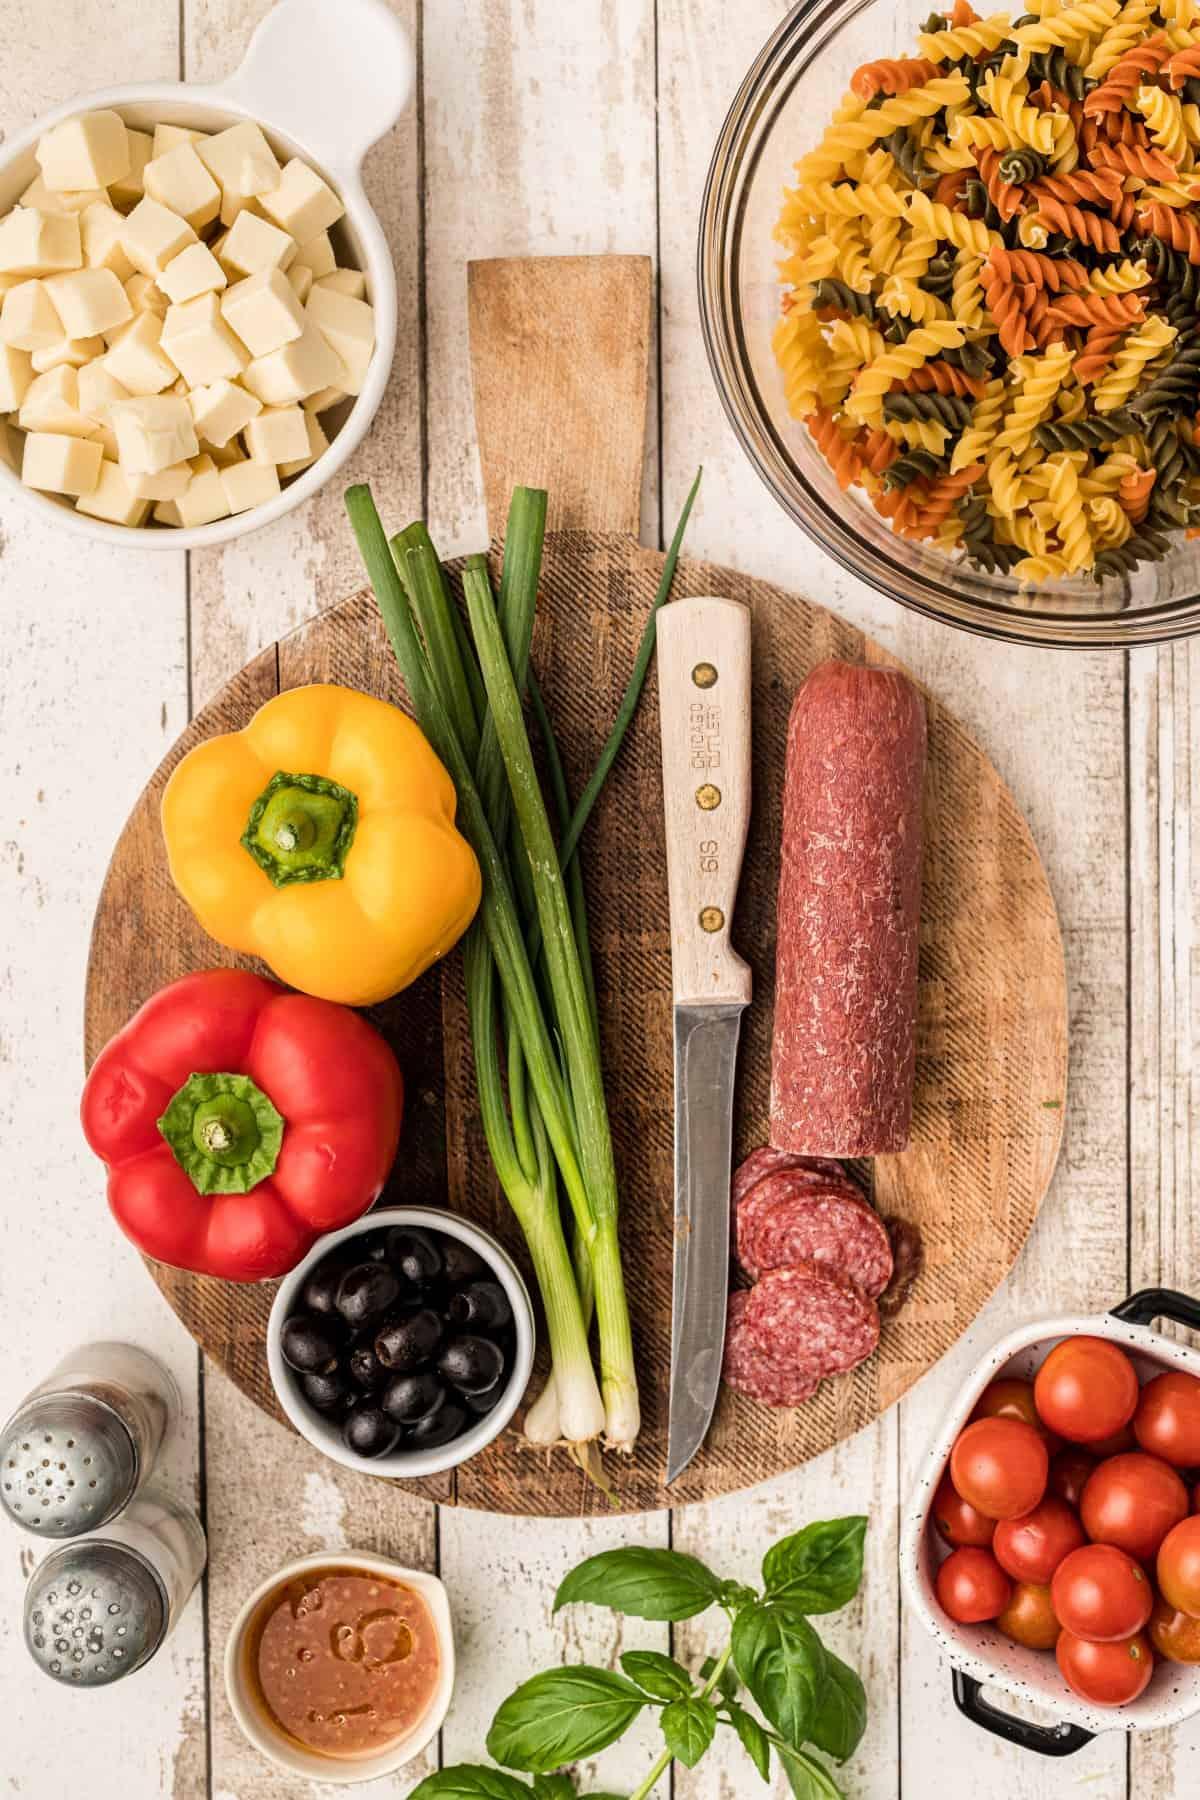 Ingredients for the Best Italian Pasta Salad